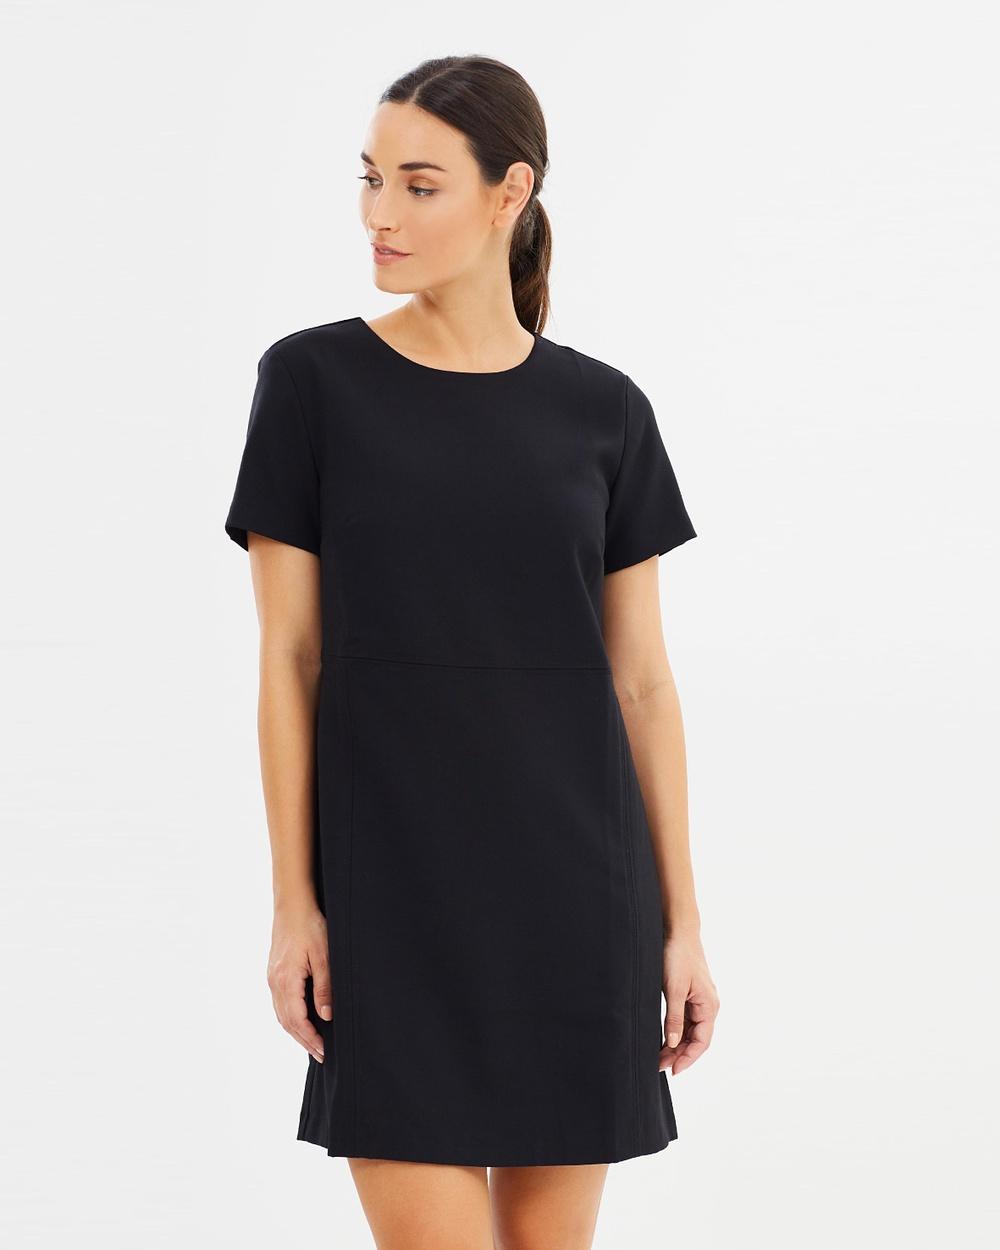 Forcast Brooklyn Shift Dress Dresses Black Brooklyn Shift Dress